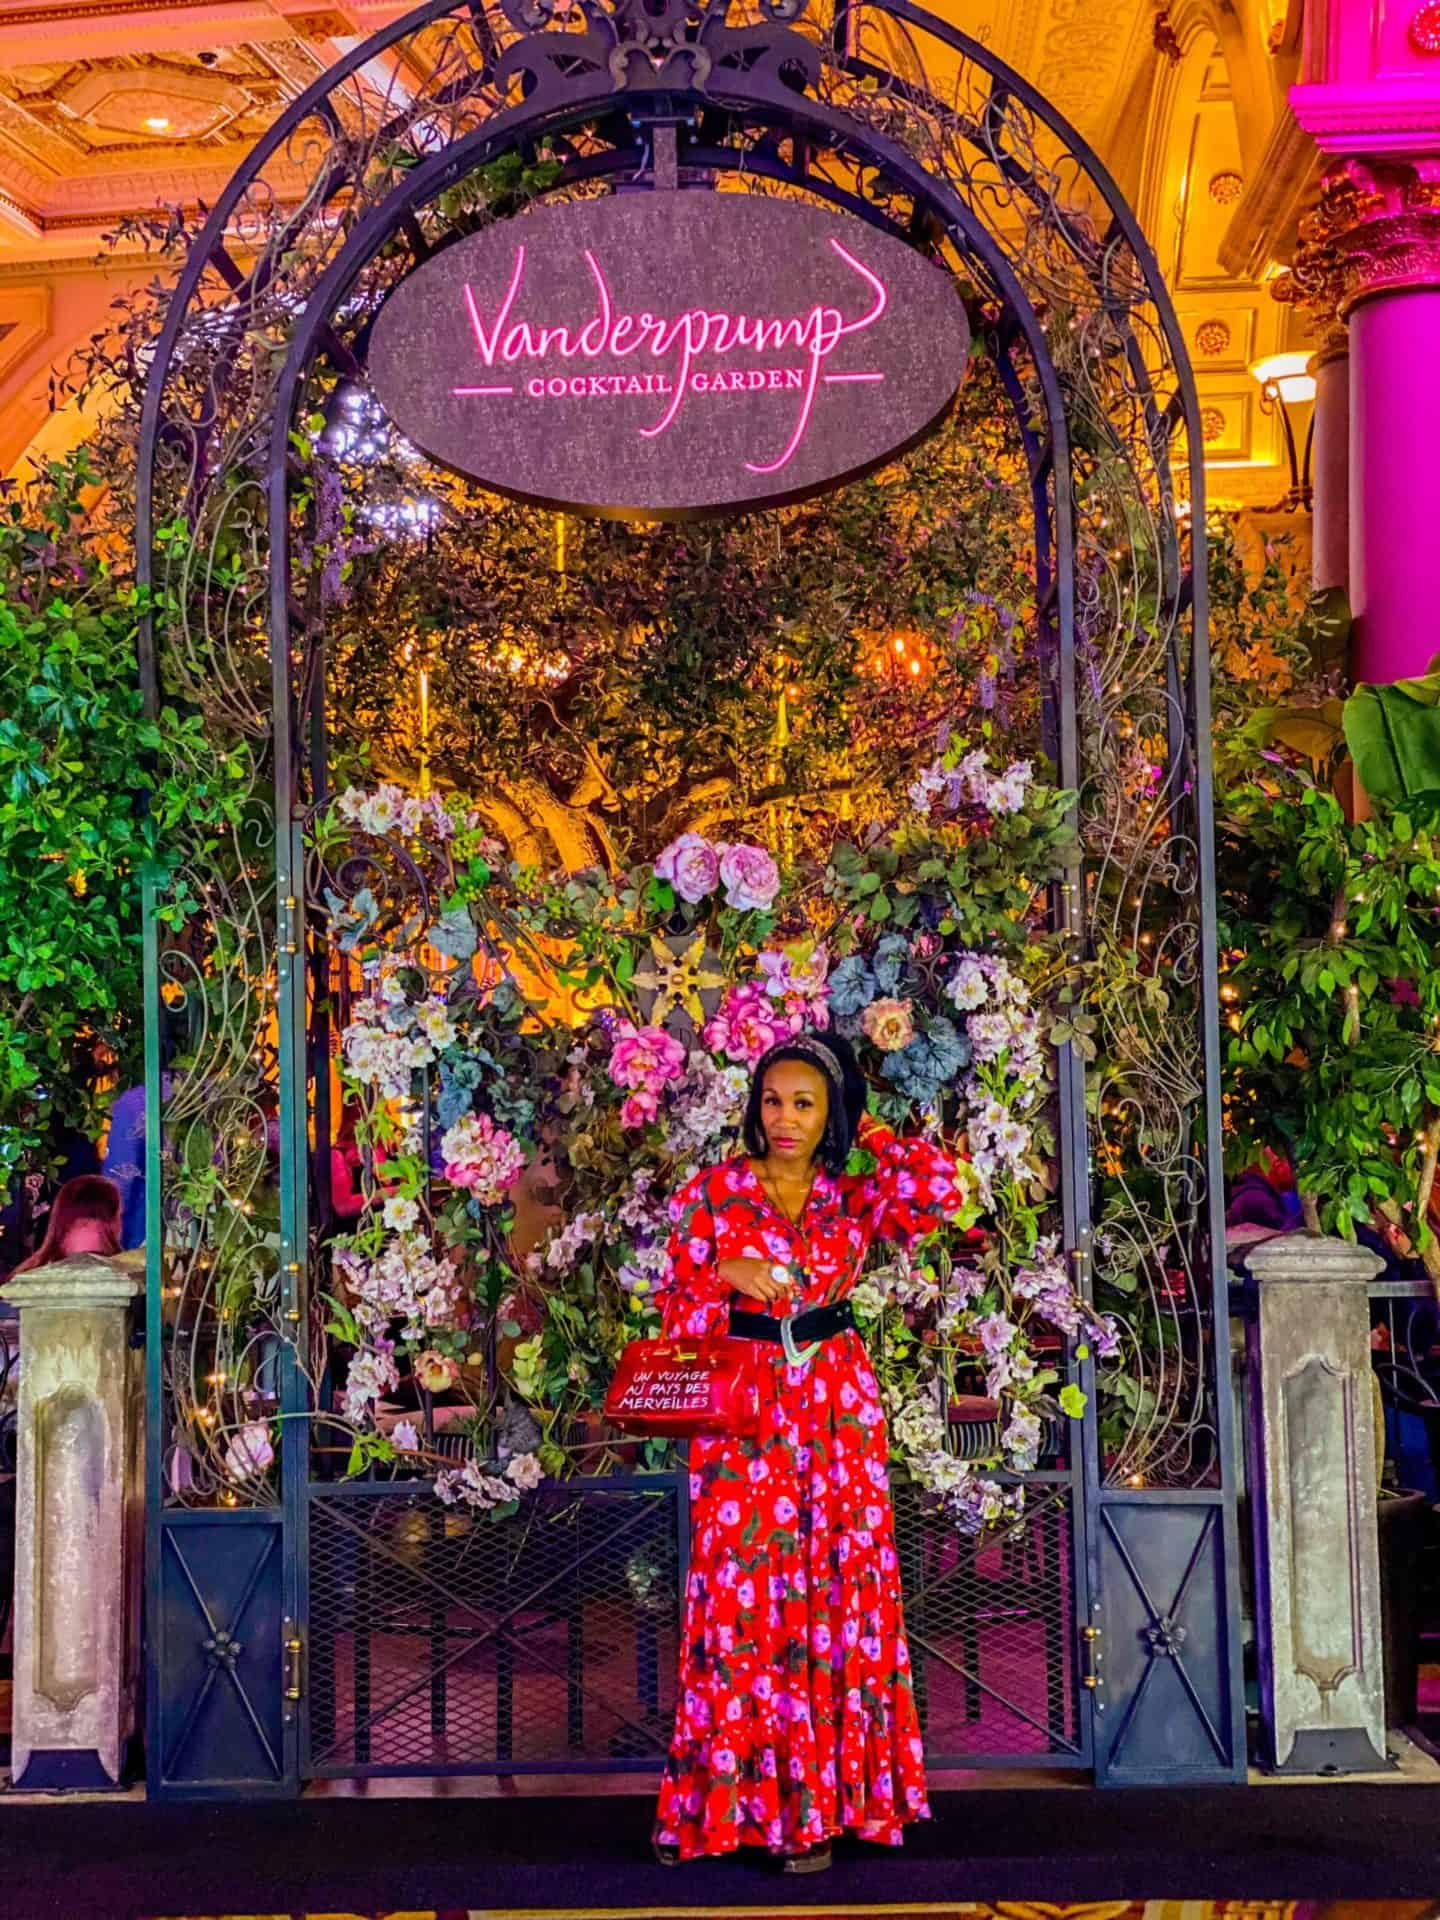 Visit Vanderpump Cocktail Garden Las Vegas